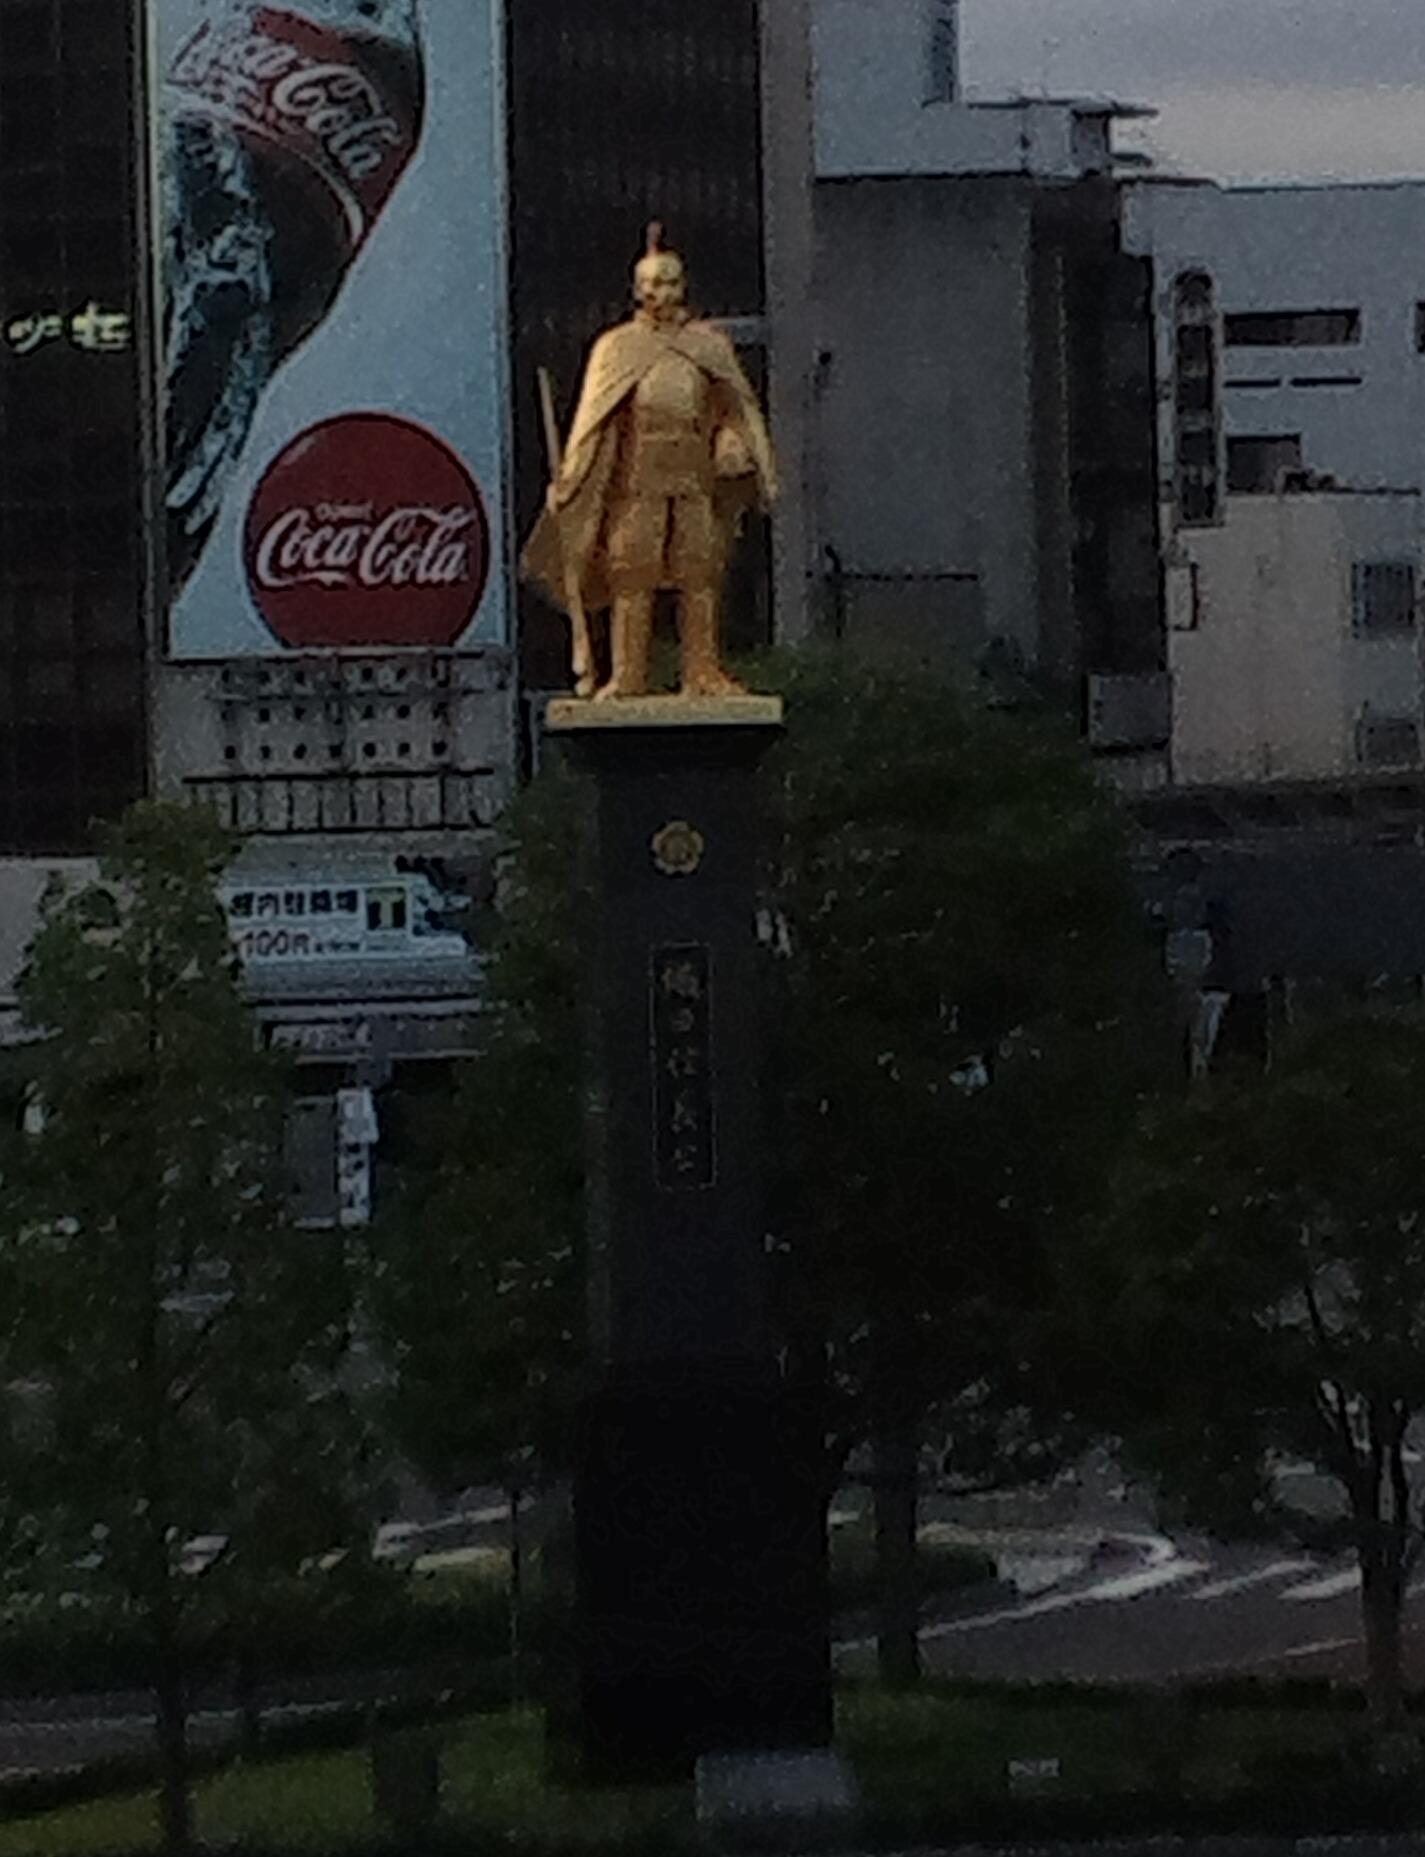 岐阜駅の信長像 (岐阜市)_e0180752_18175832.jpg